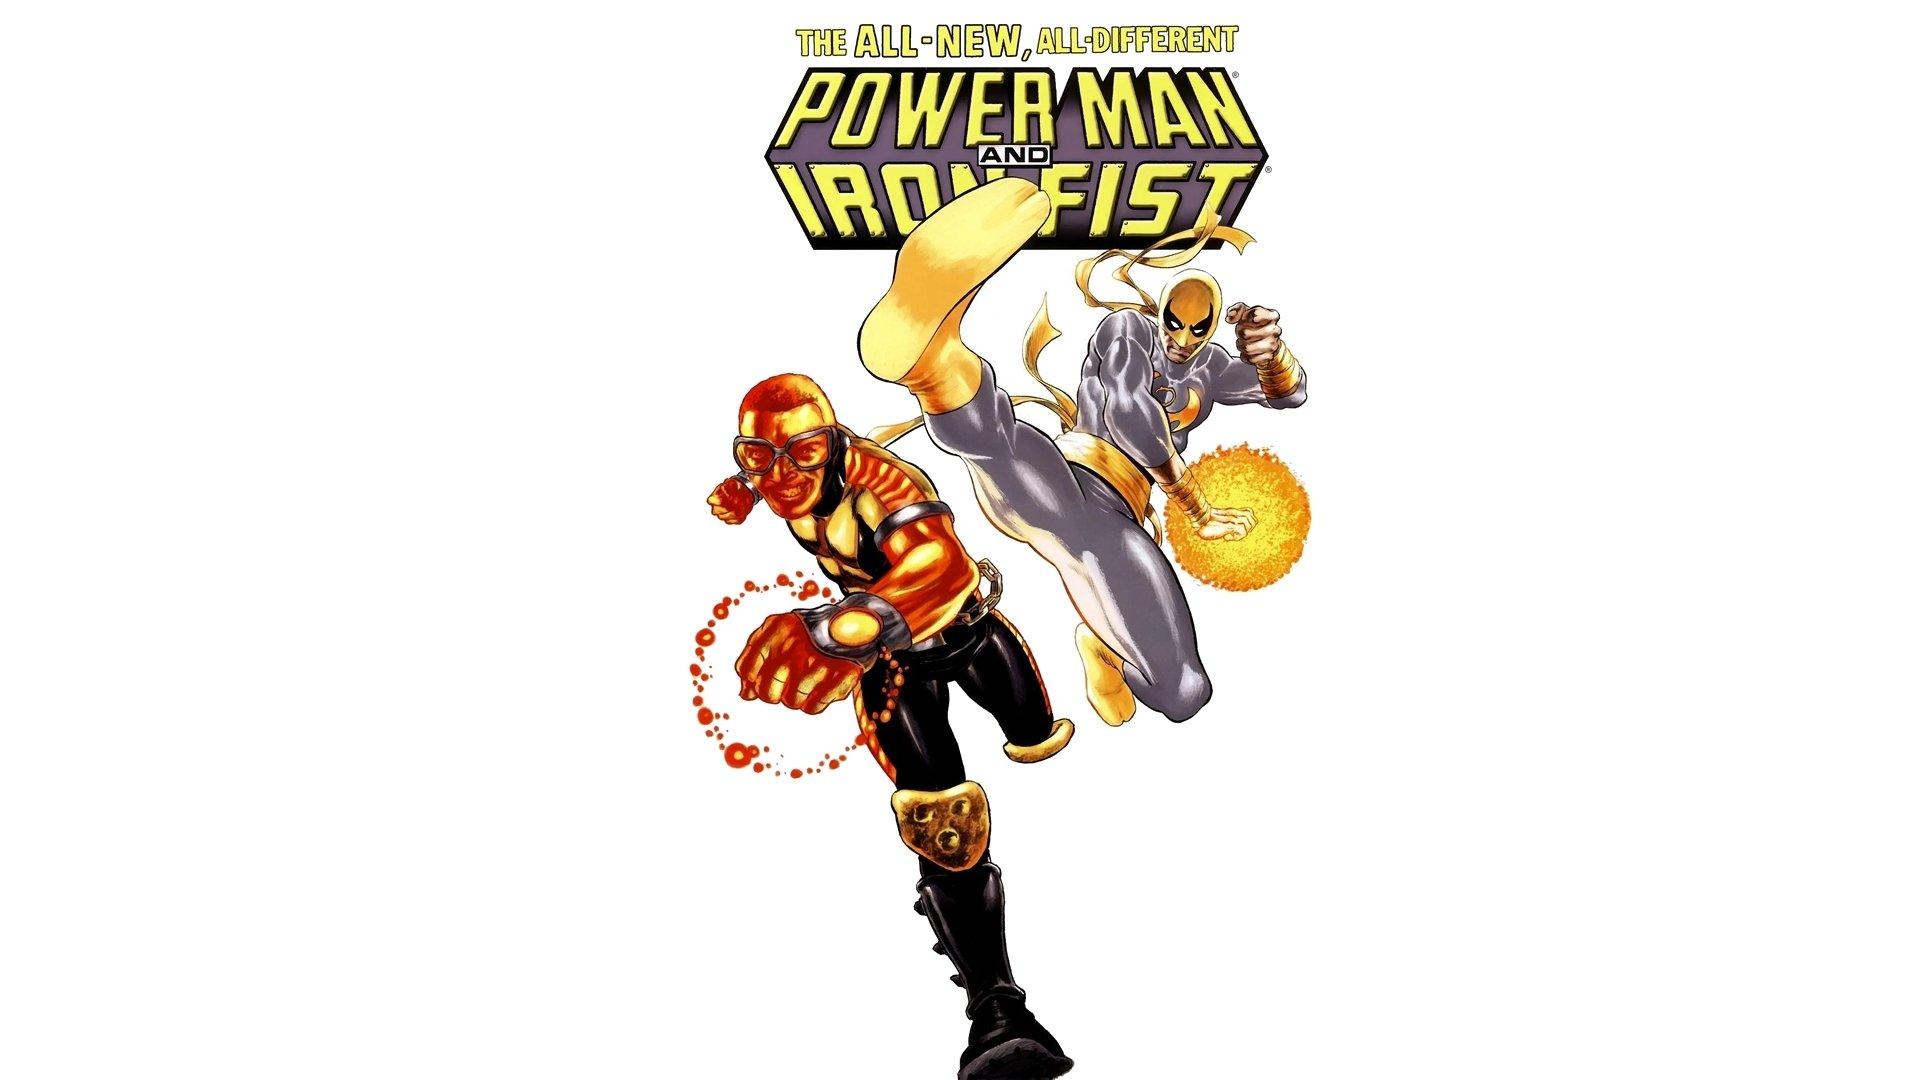 Iron man hd wallpapers backgrounds wallpaper abyss - Hd Wallpaper Background Id 471448 1920x1080 Comics Power Man Iron Fist